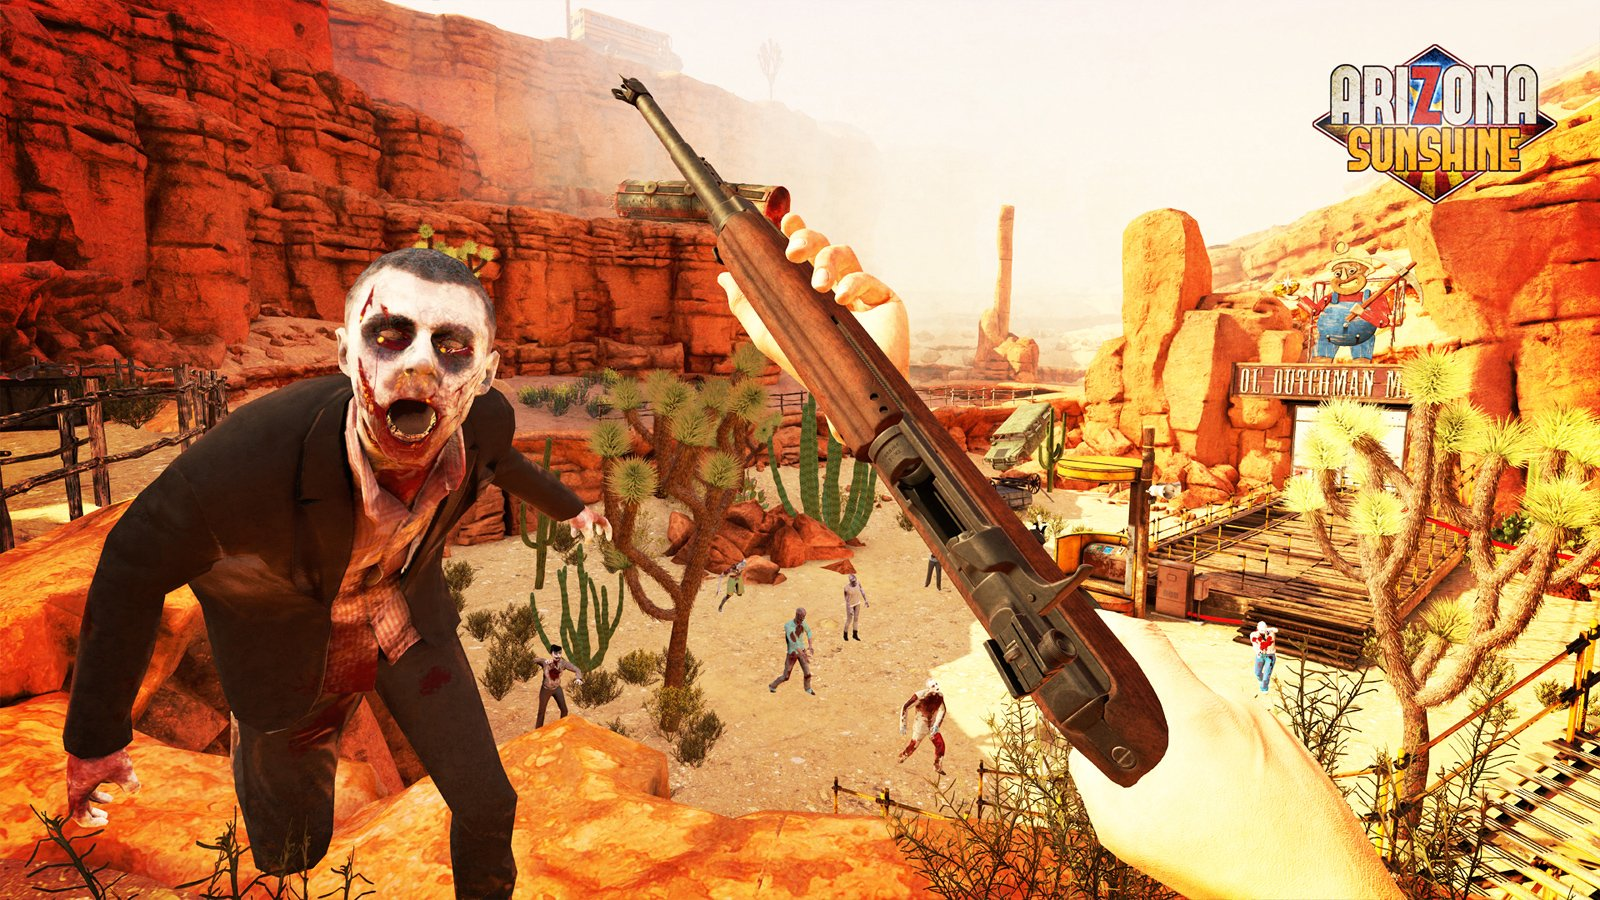 Arizona Sunshine makes good use of the PlayStation VR Aim Controller screenshot